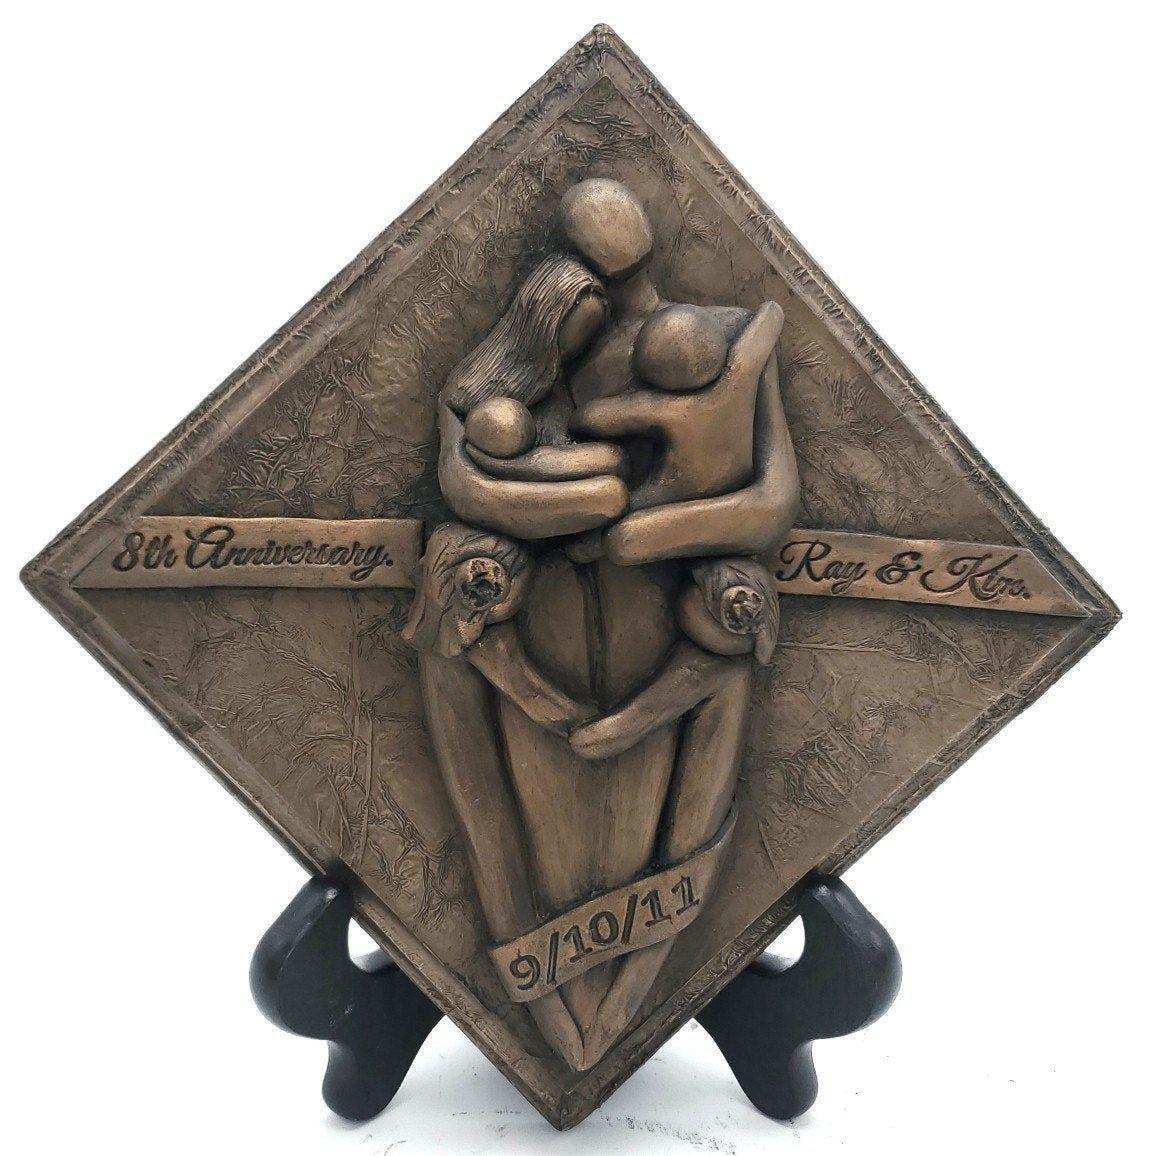 8th anniversary bronze plaque anniversary gift eighth